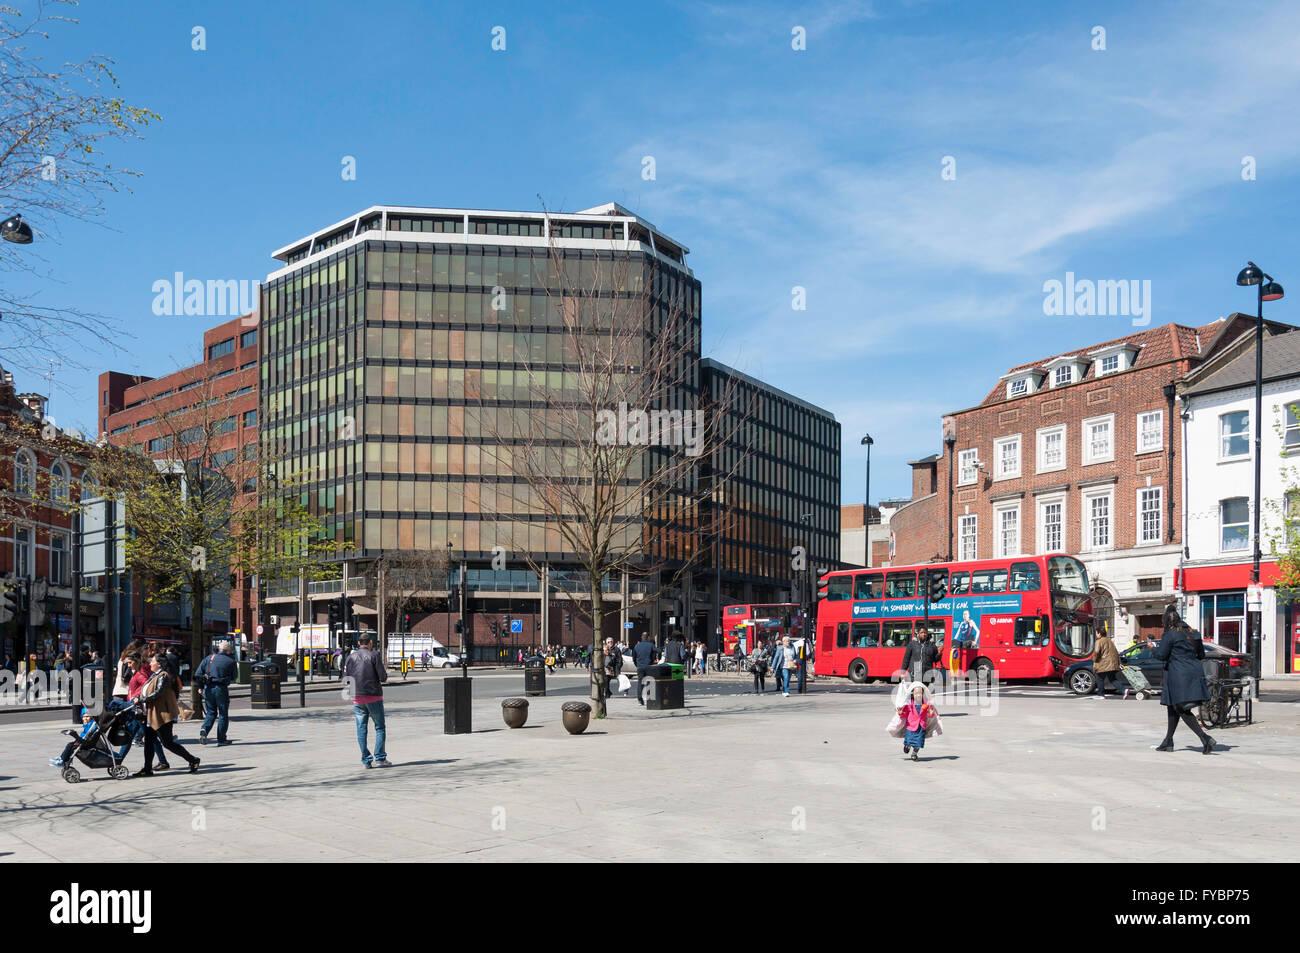 High Road, Wood Green, London Borough of Haringey, Greater London, England, United Kingdom - Stock Image